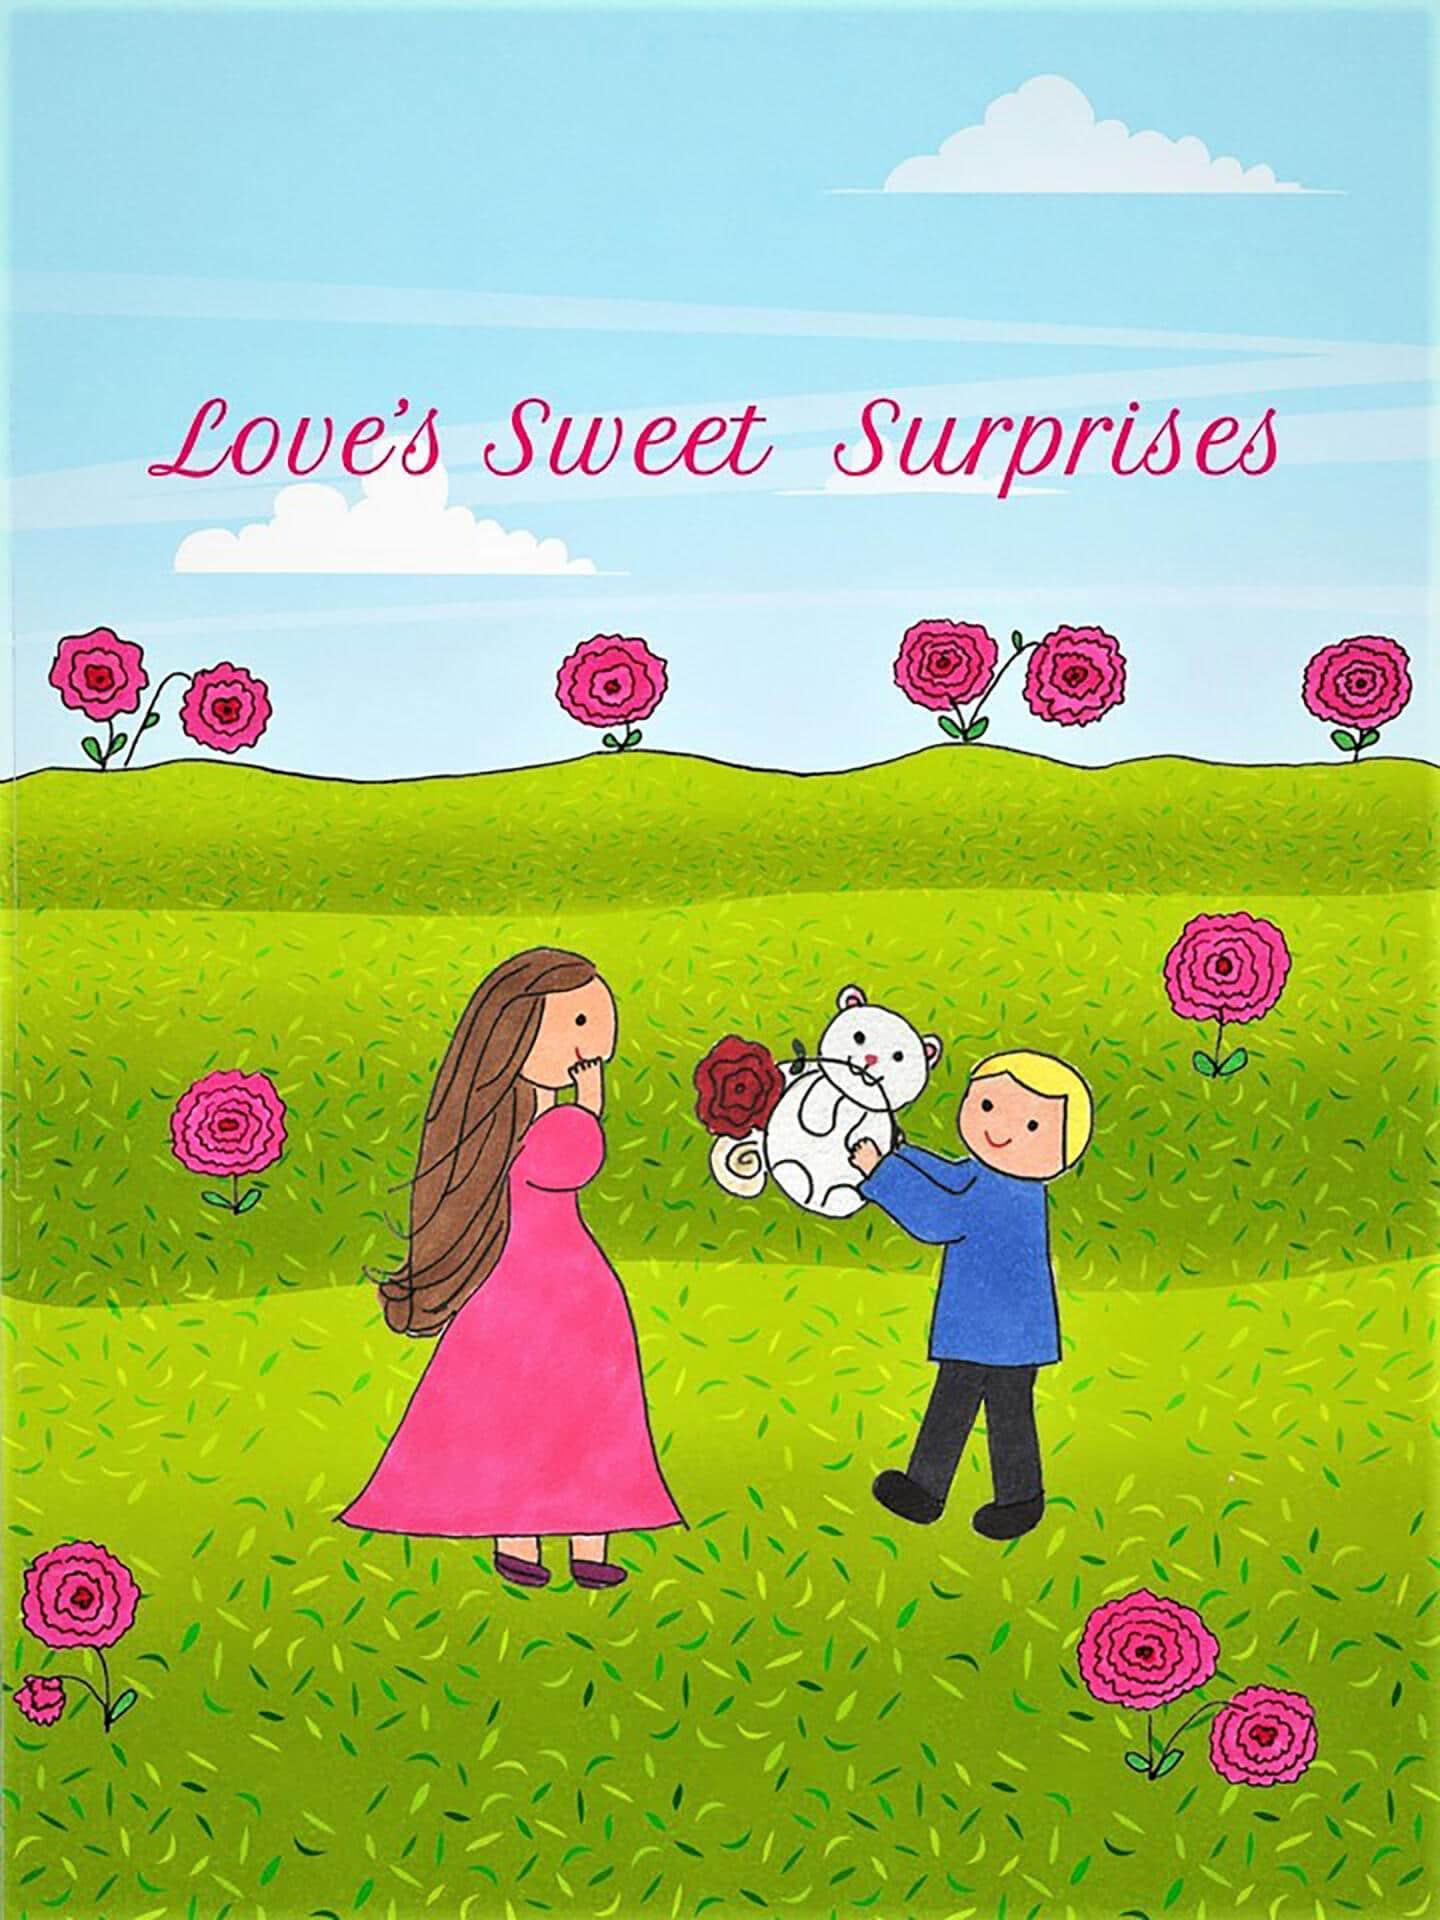 Love's Sweet Surprises eCard